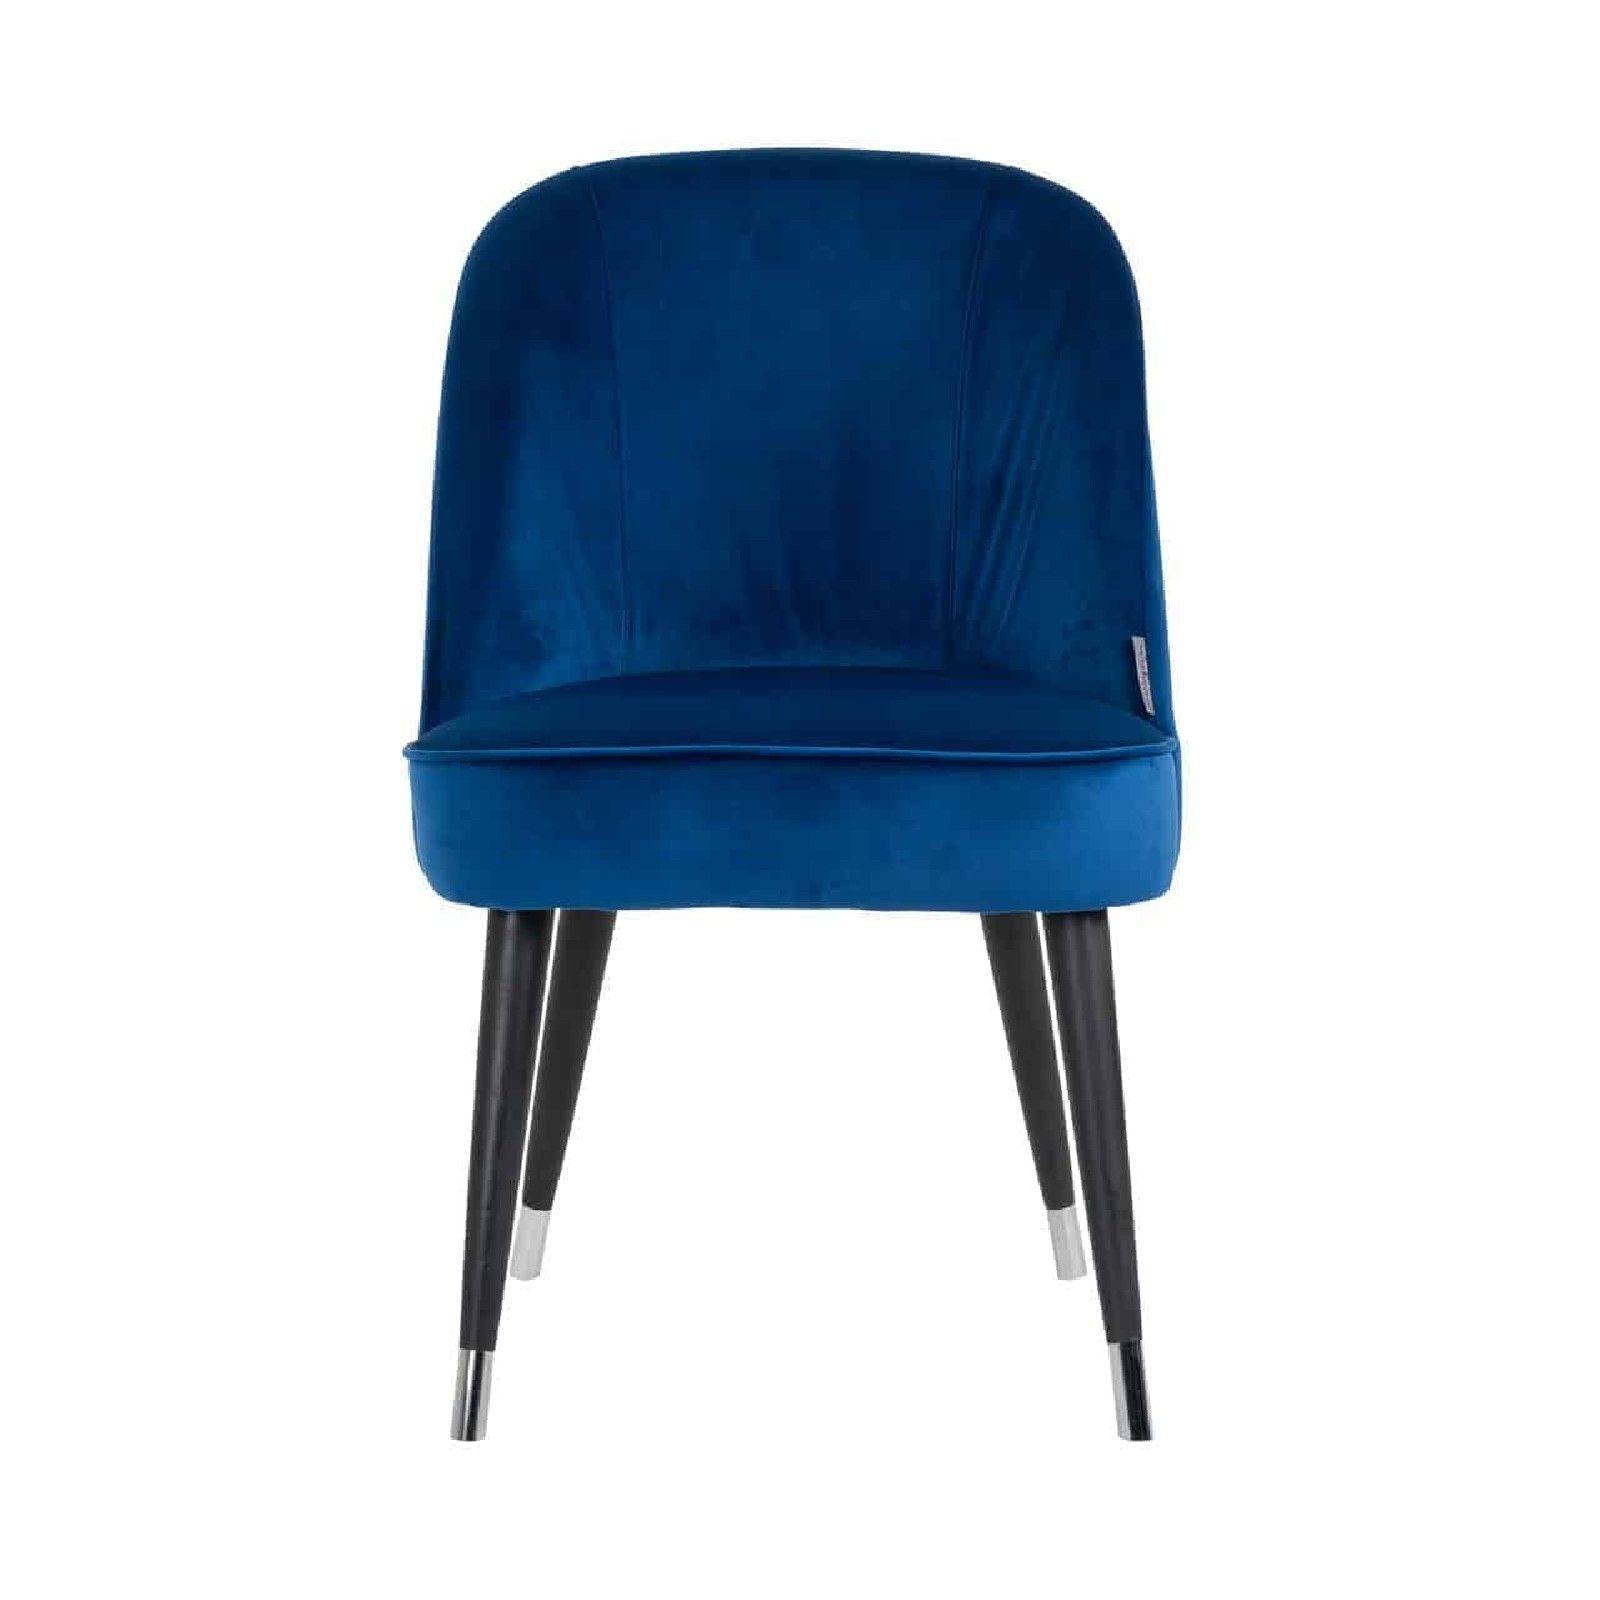 Chaise Julius, Fire Retardant Blue Velvet, Silver footcap Salle à manger - 64